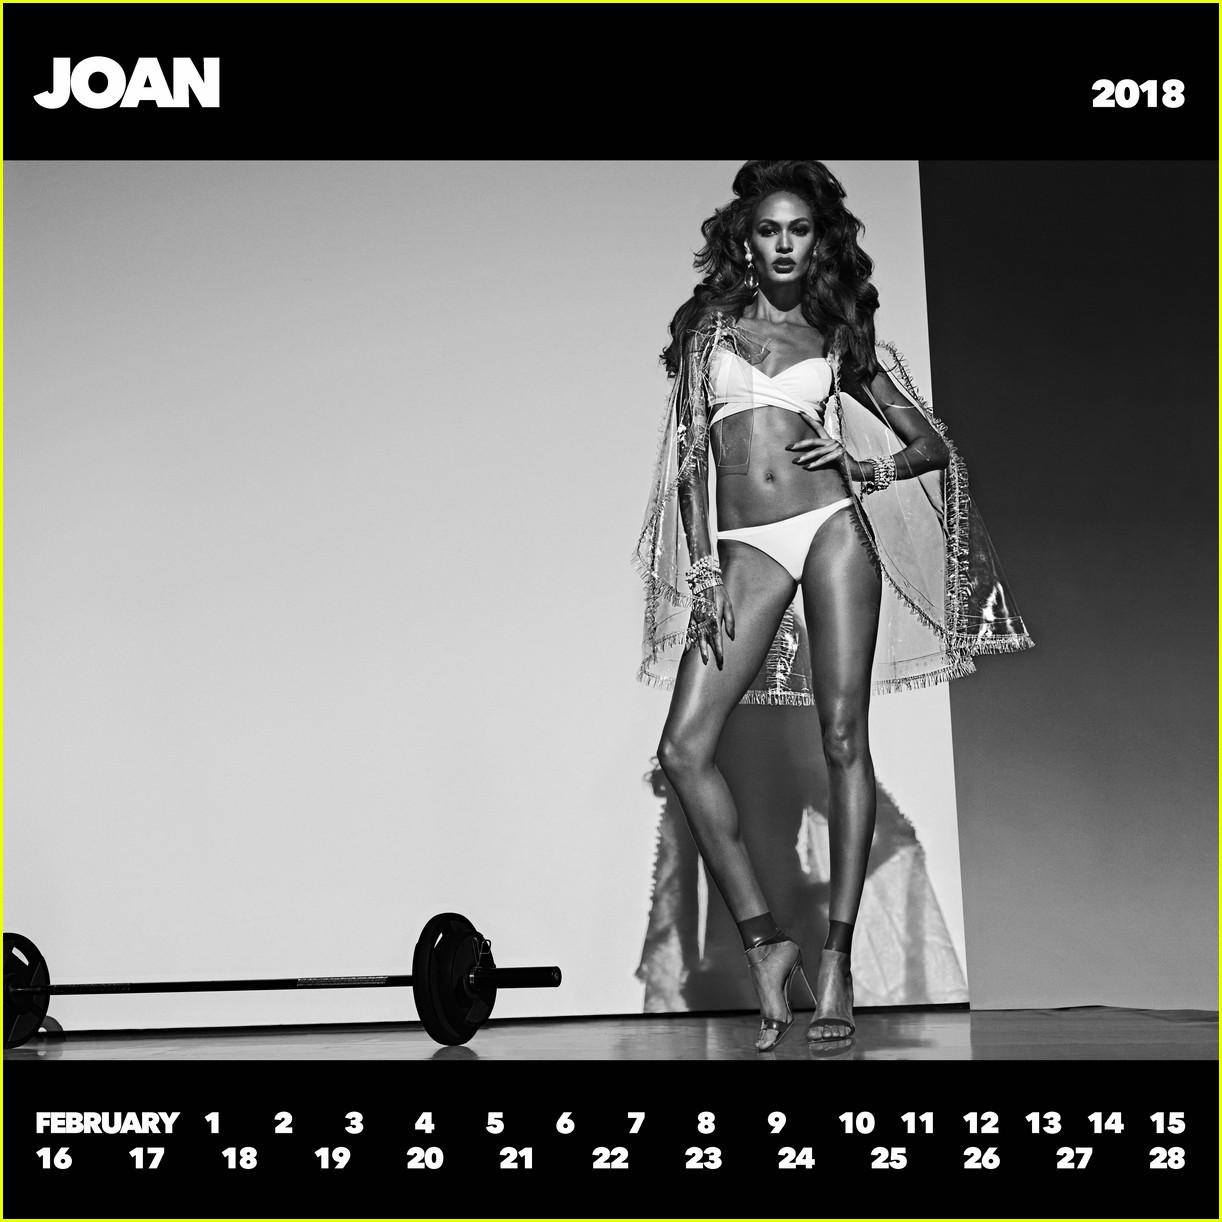 Gigi Hadid, Joan Smalls & More Star in 'CR Girls 2018' Calendar to